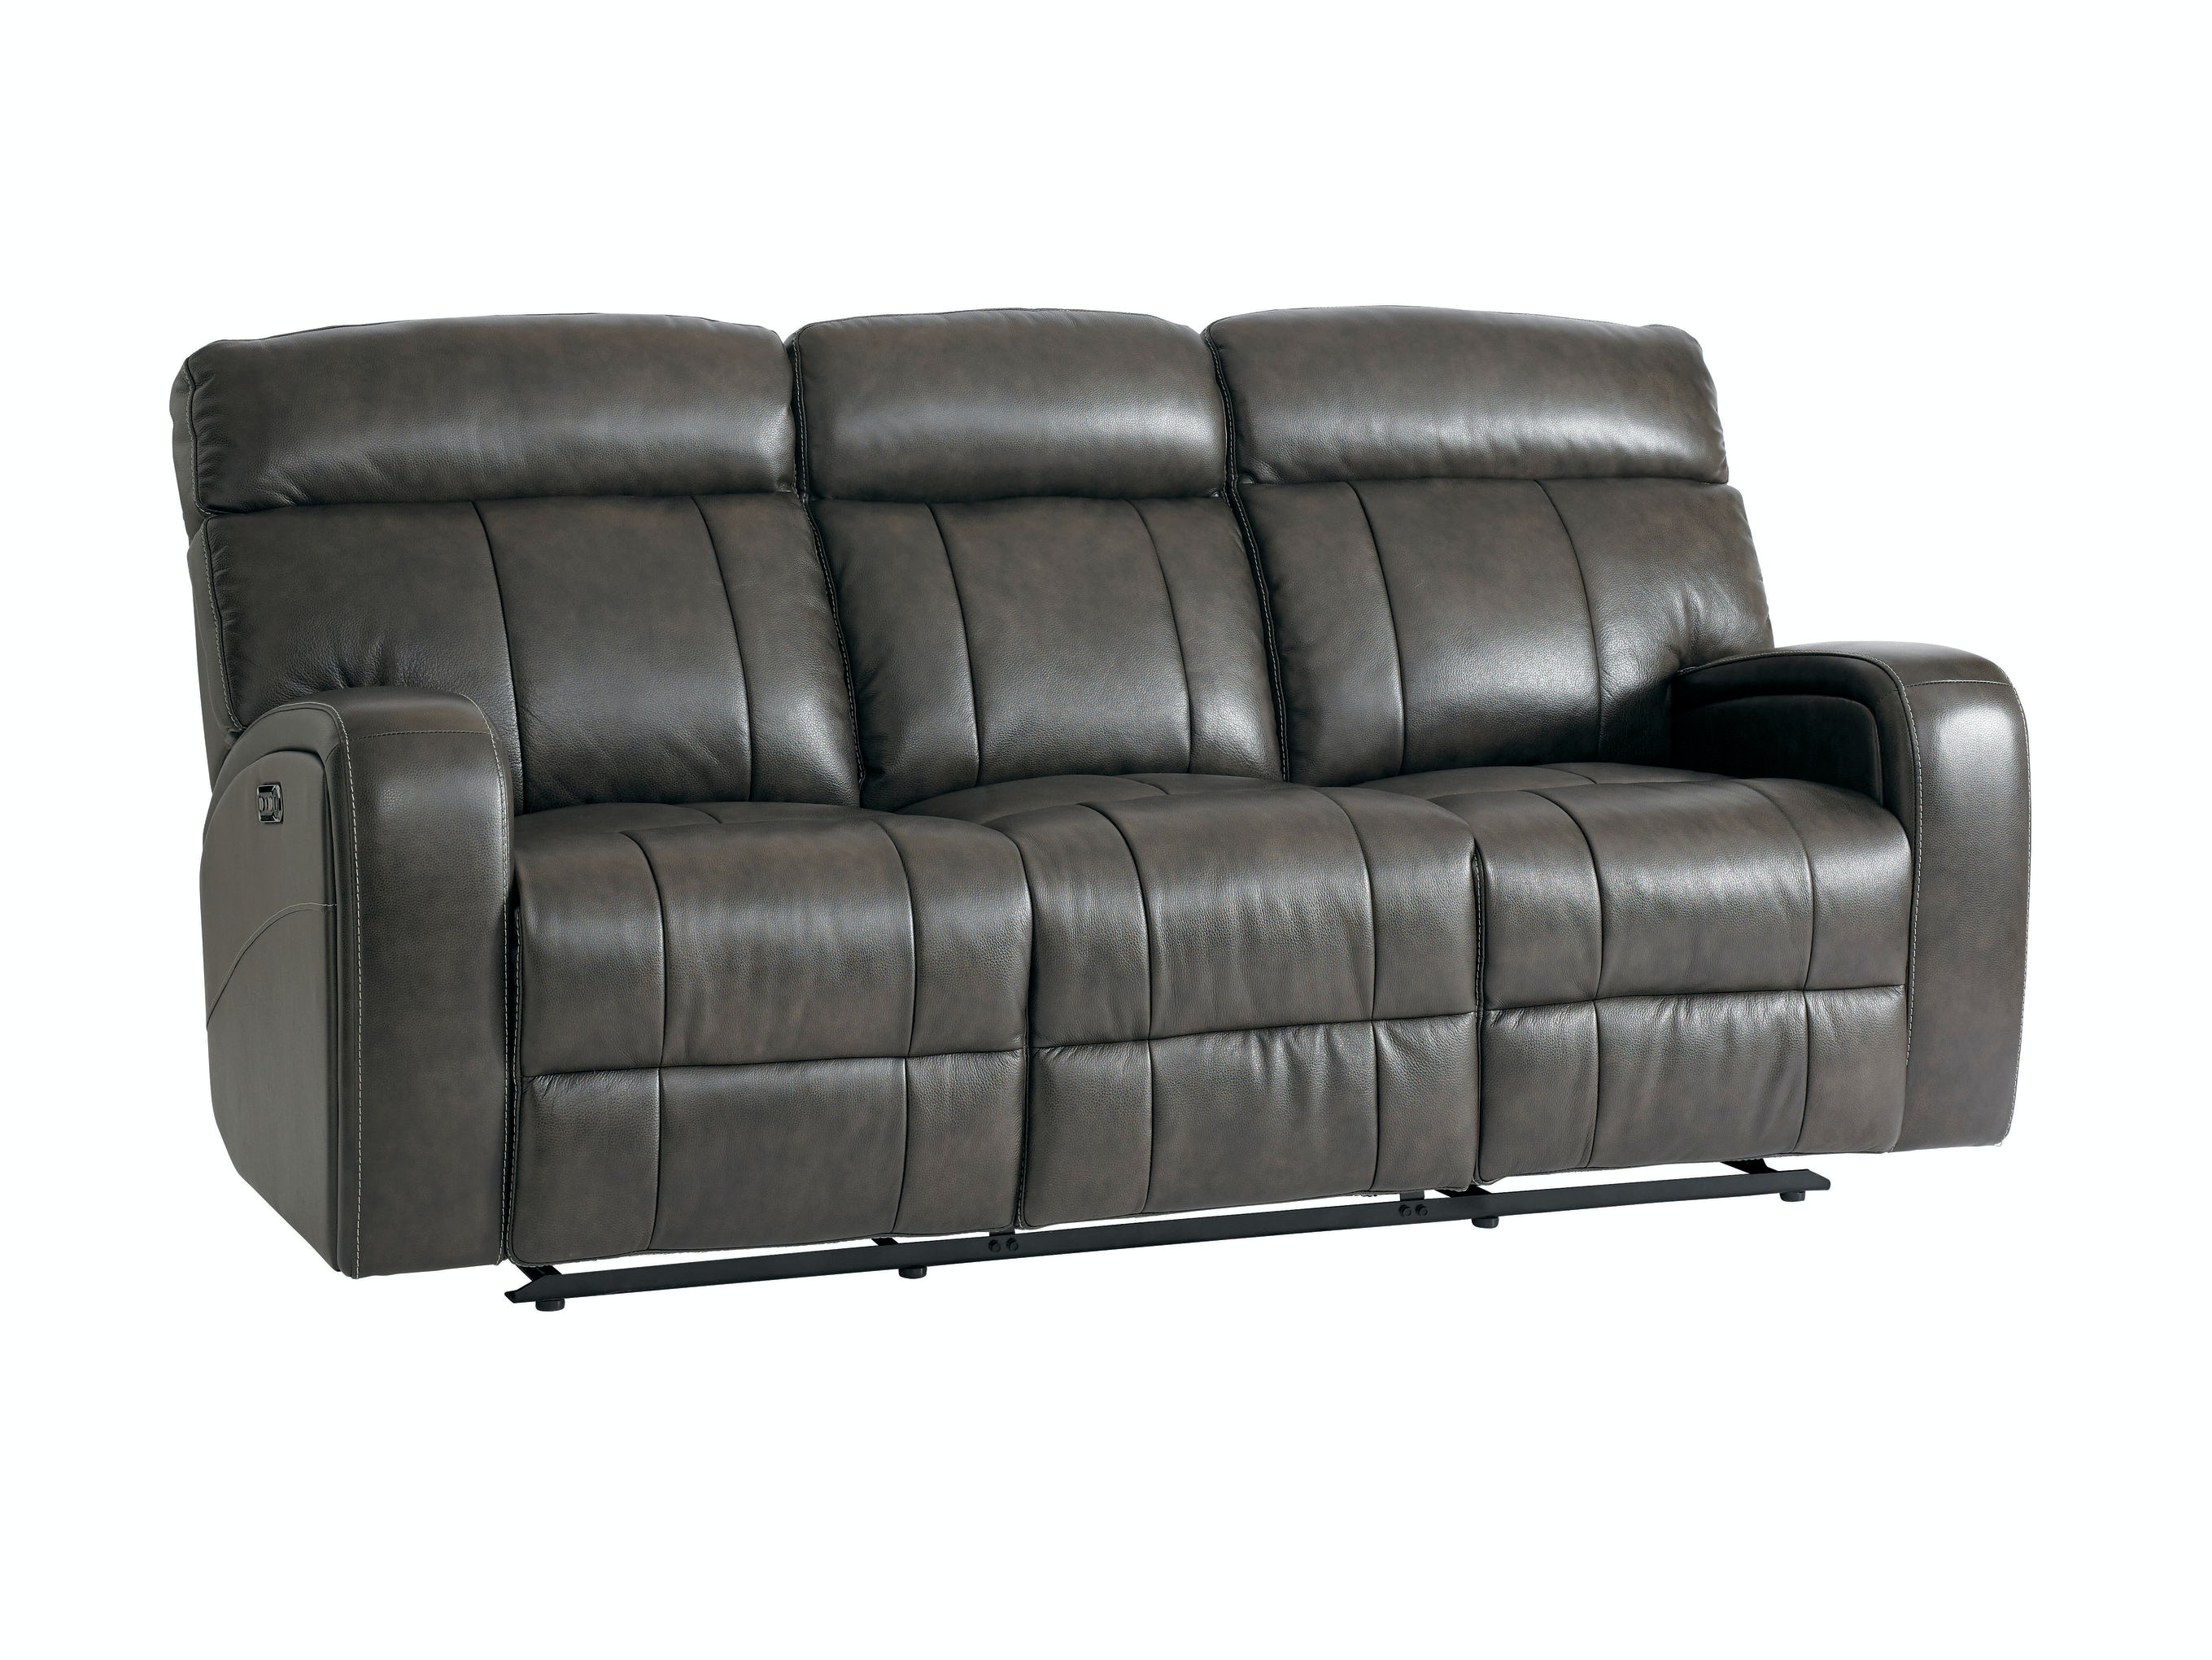 bassett beaumont power reclining sofa 742062 talsma furniture rh talsmafurniture com leather power reclining sofa set leather power reclining sofa with adjustable headrest